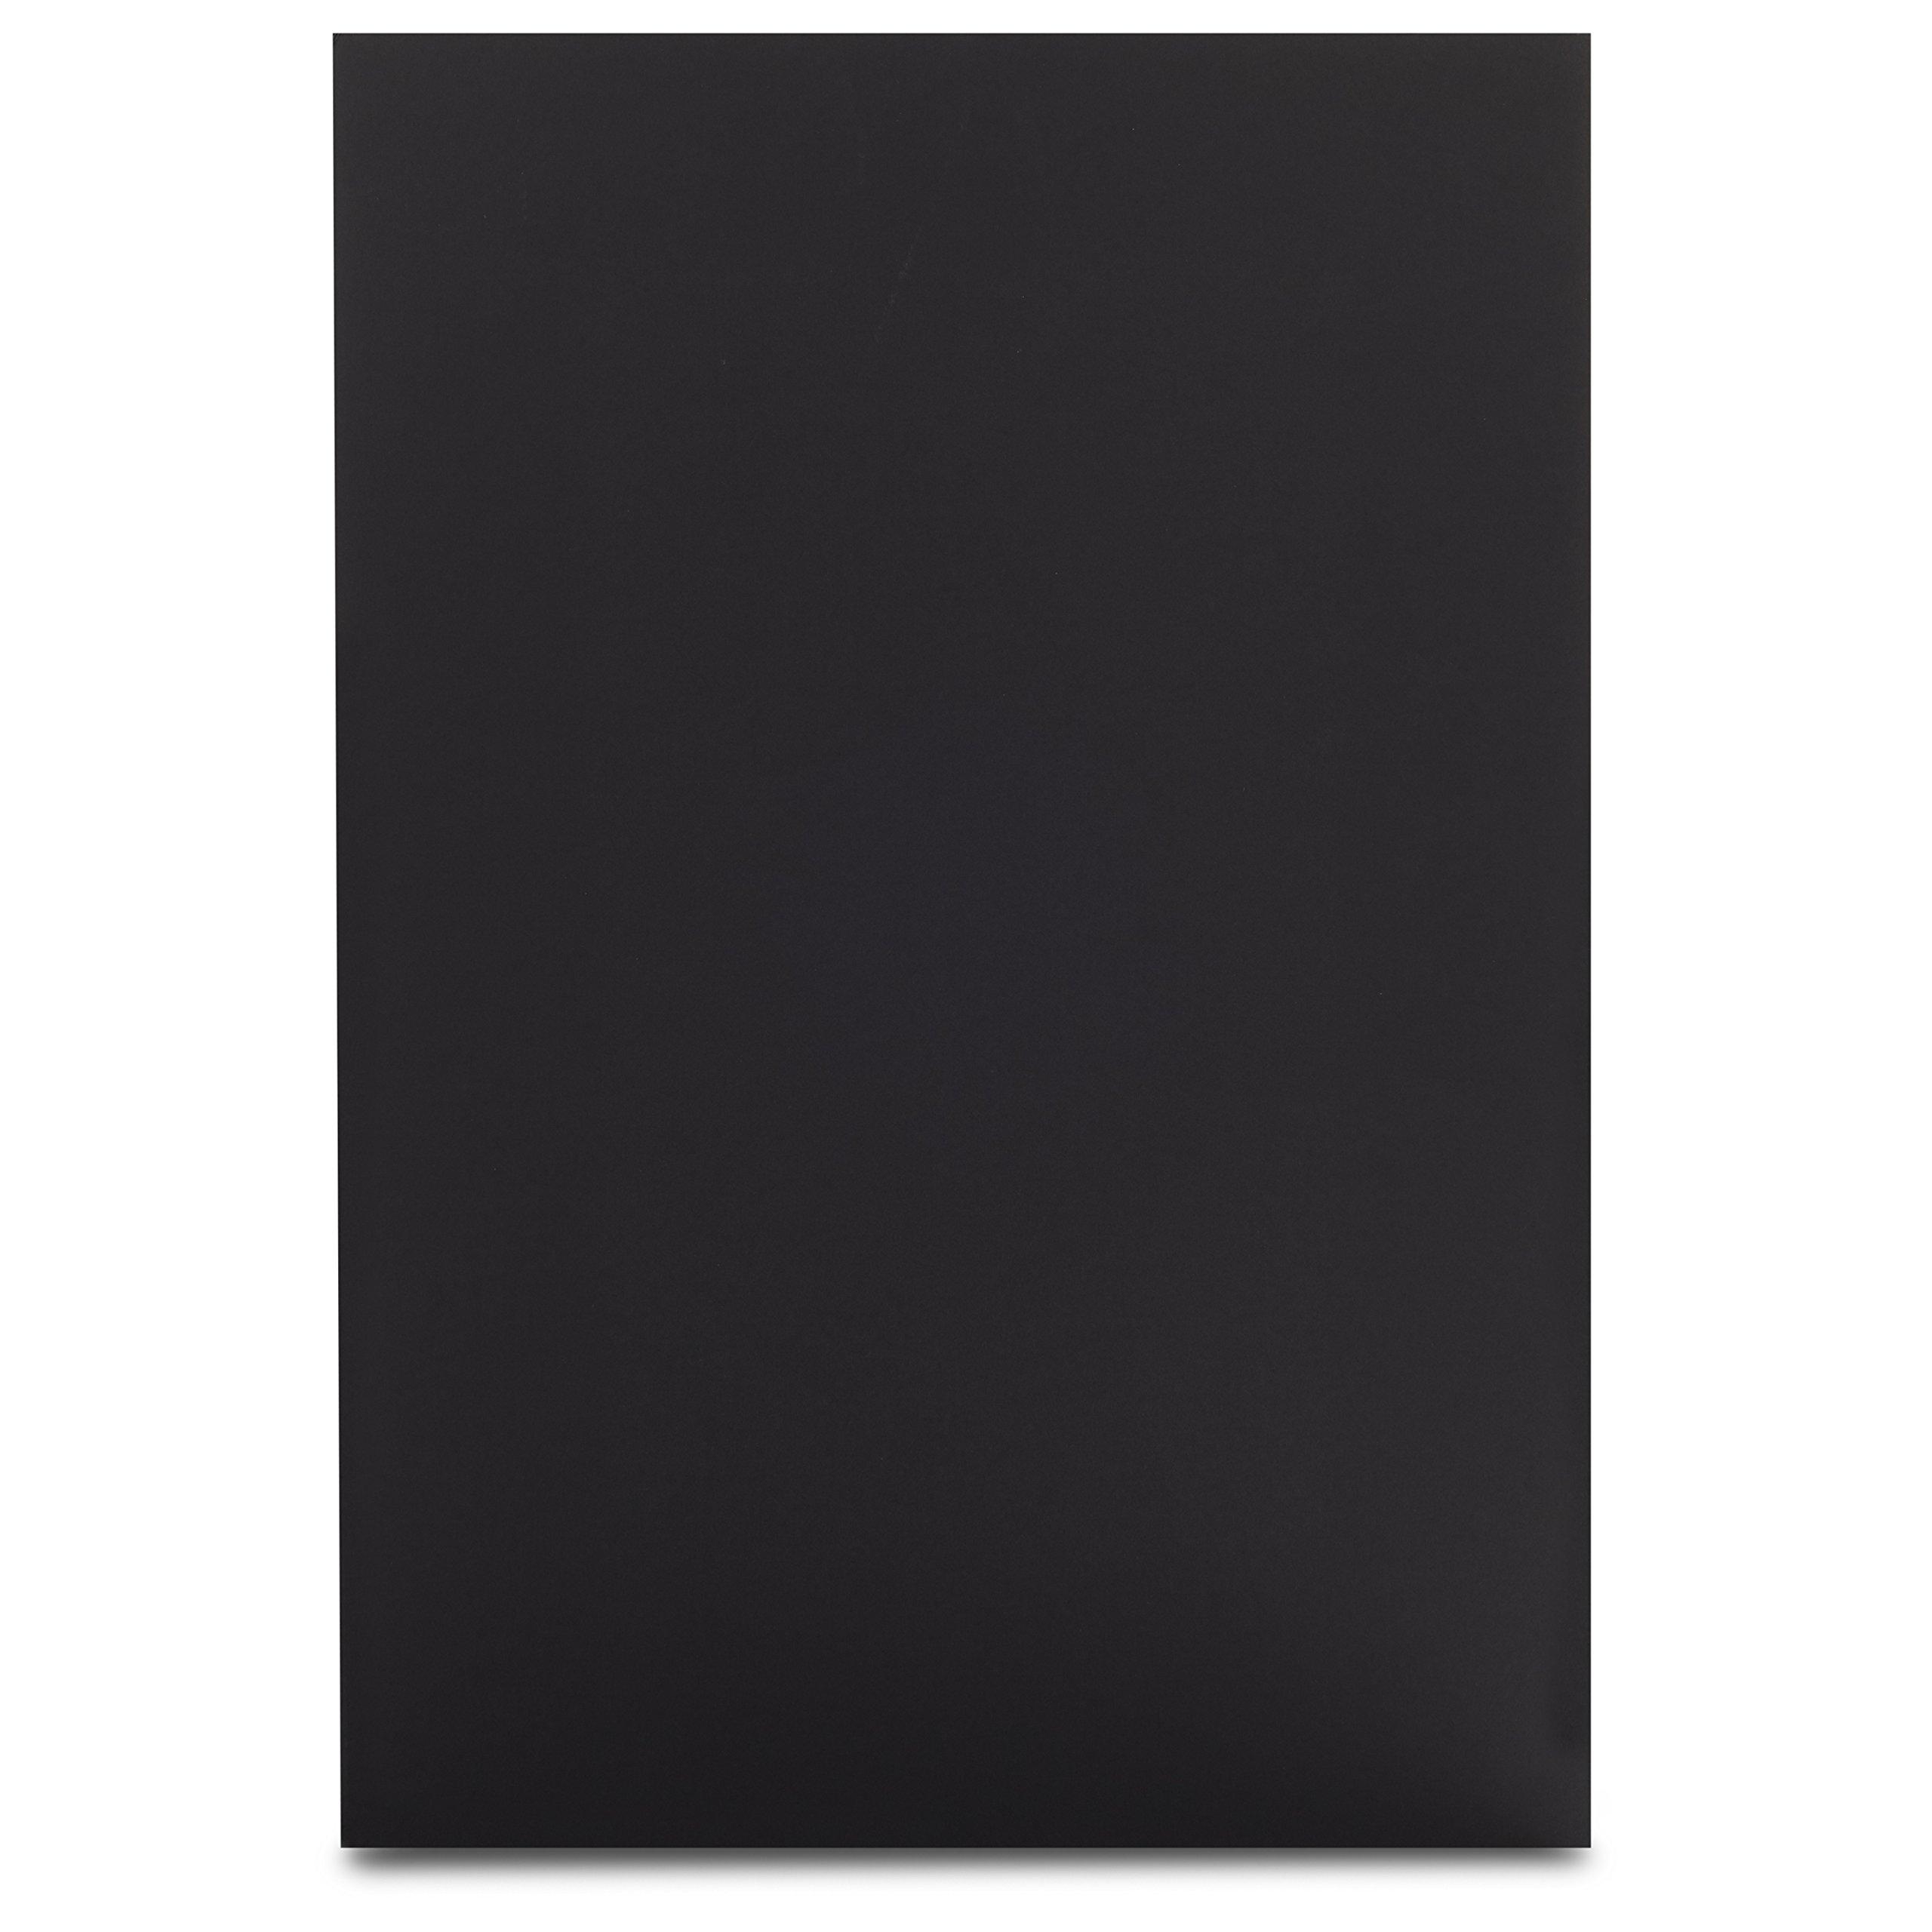 Elmer's Foam Board Multi-Pack, Black, 20x30 Inch, Pack of 10 by Elmer's